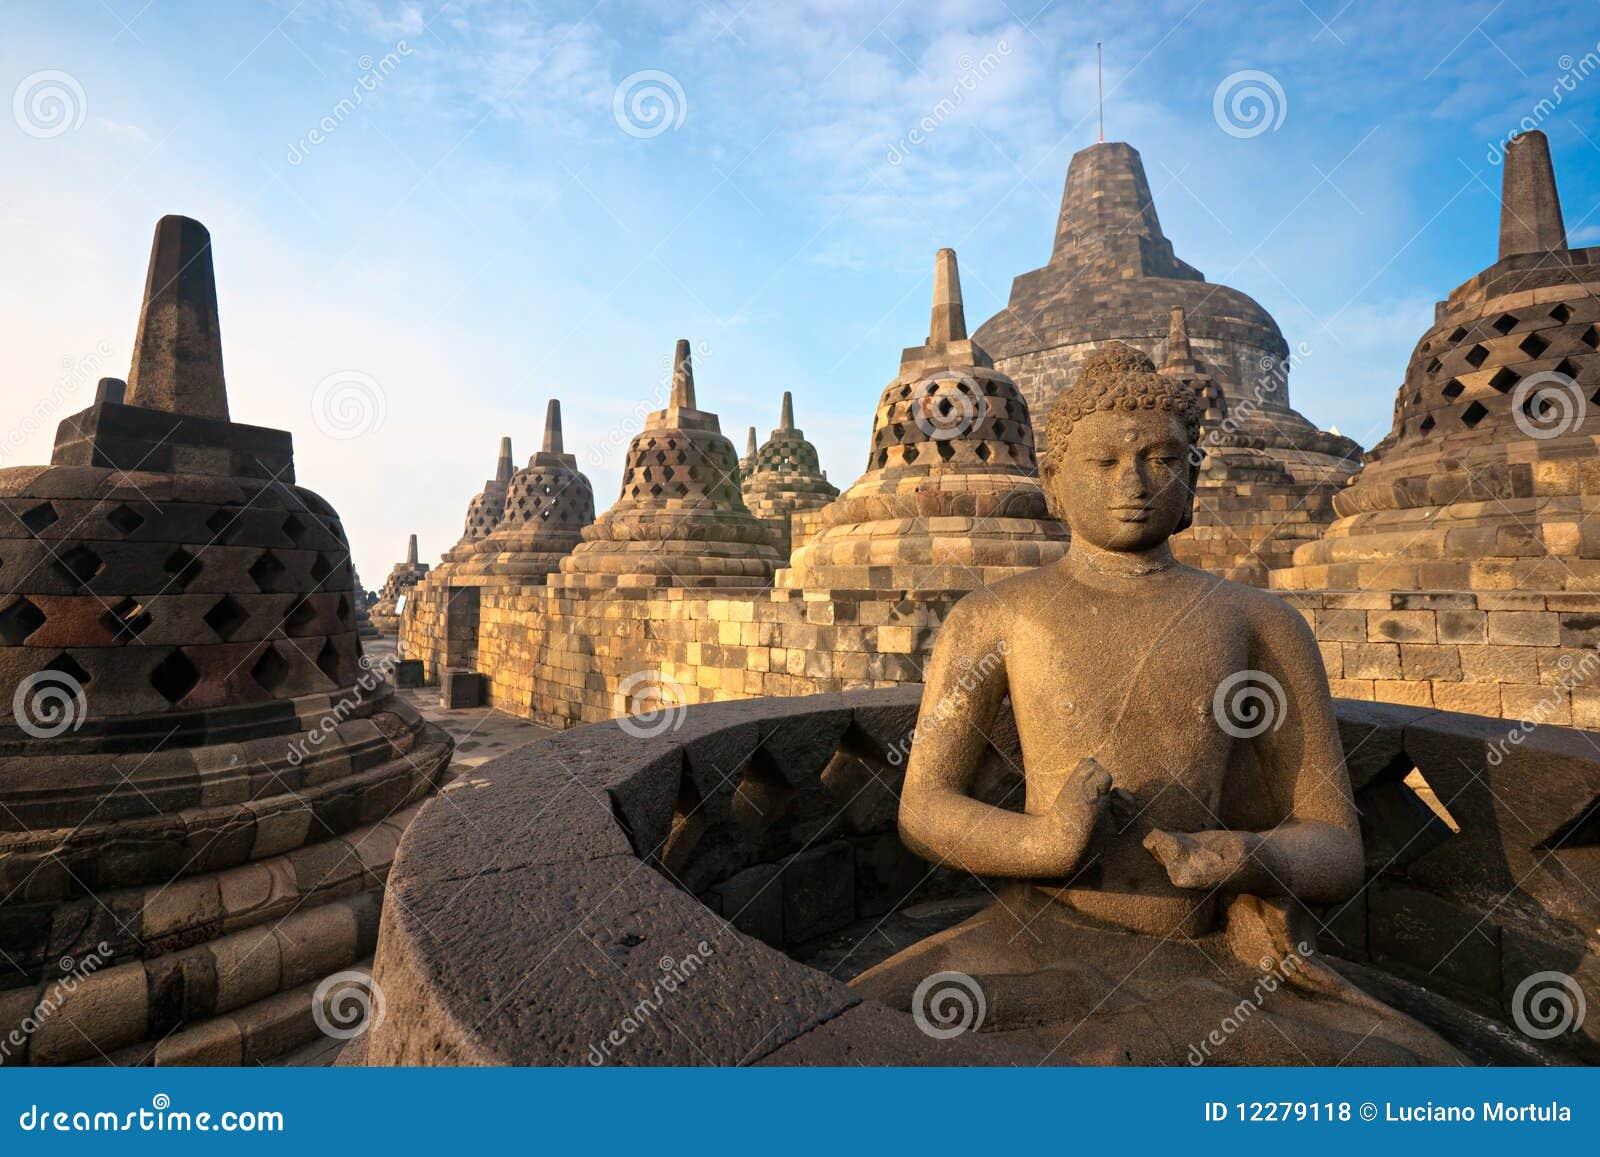 De Tempel van Borobudur, Yogyakarta, Java, Indonesië.